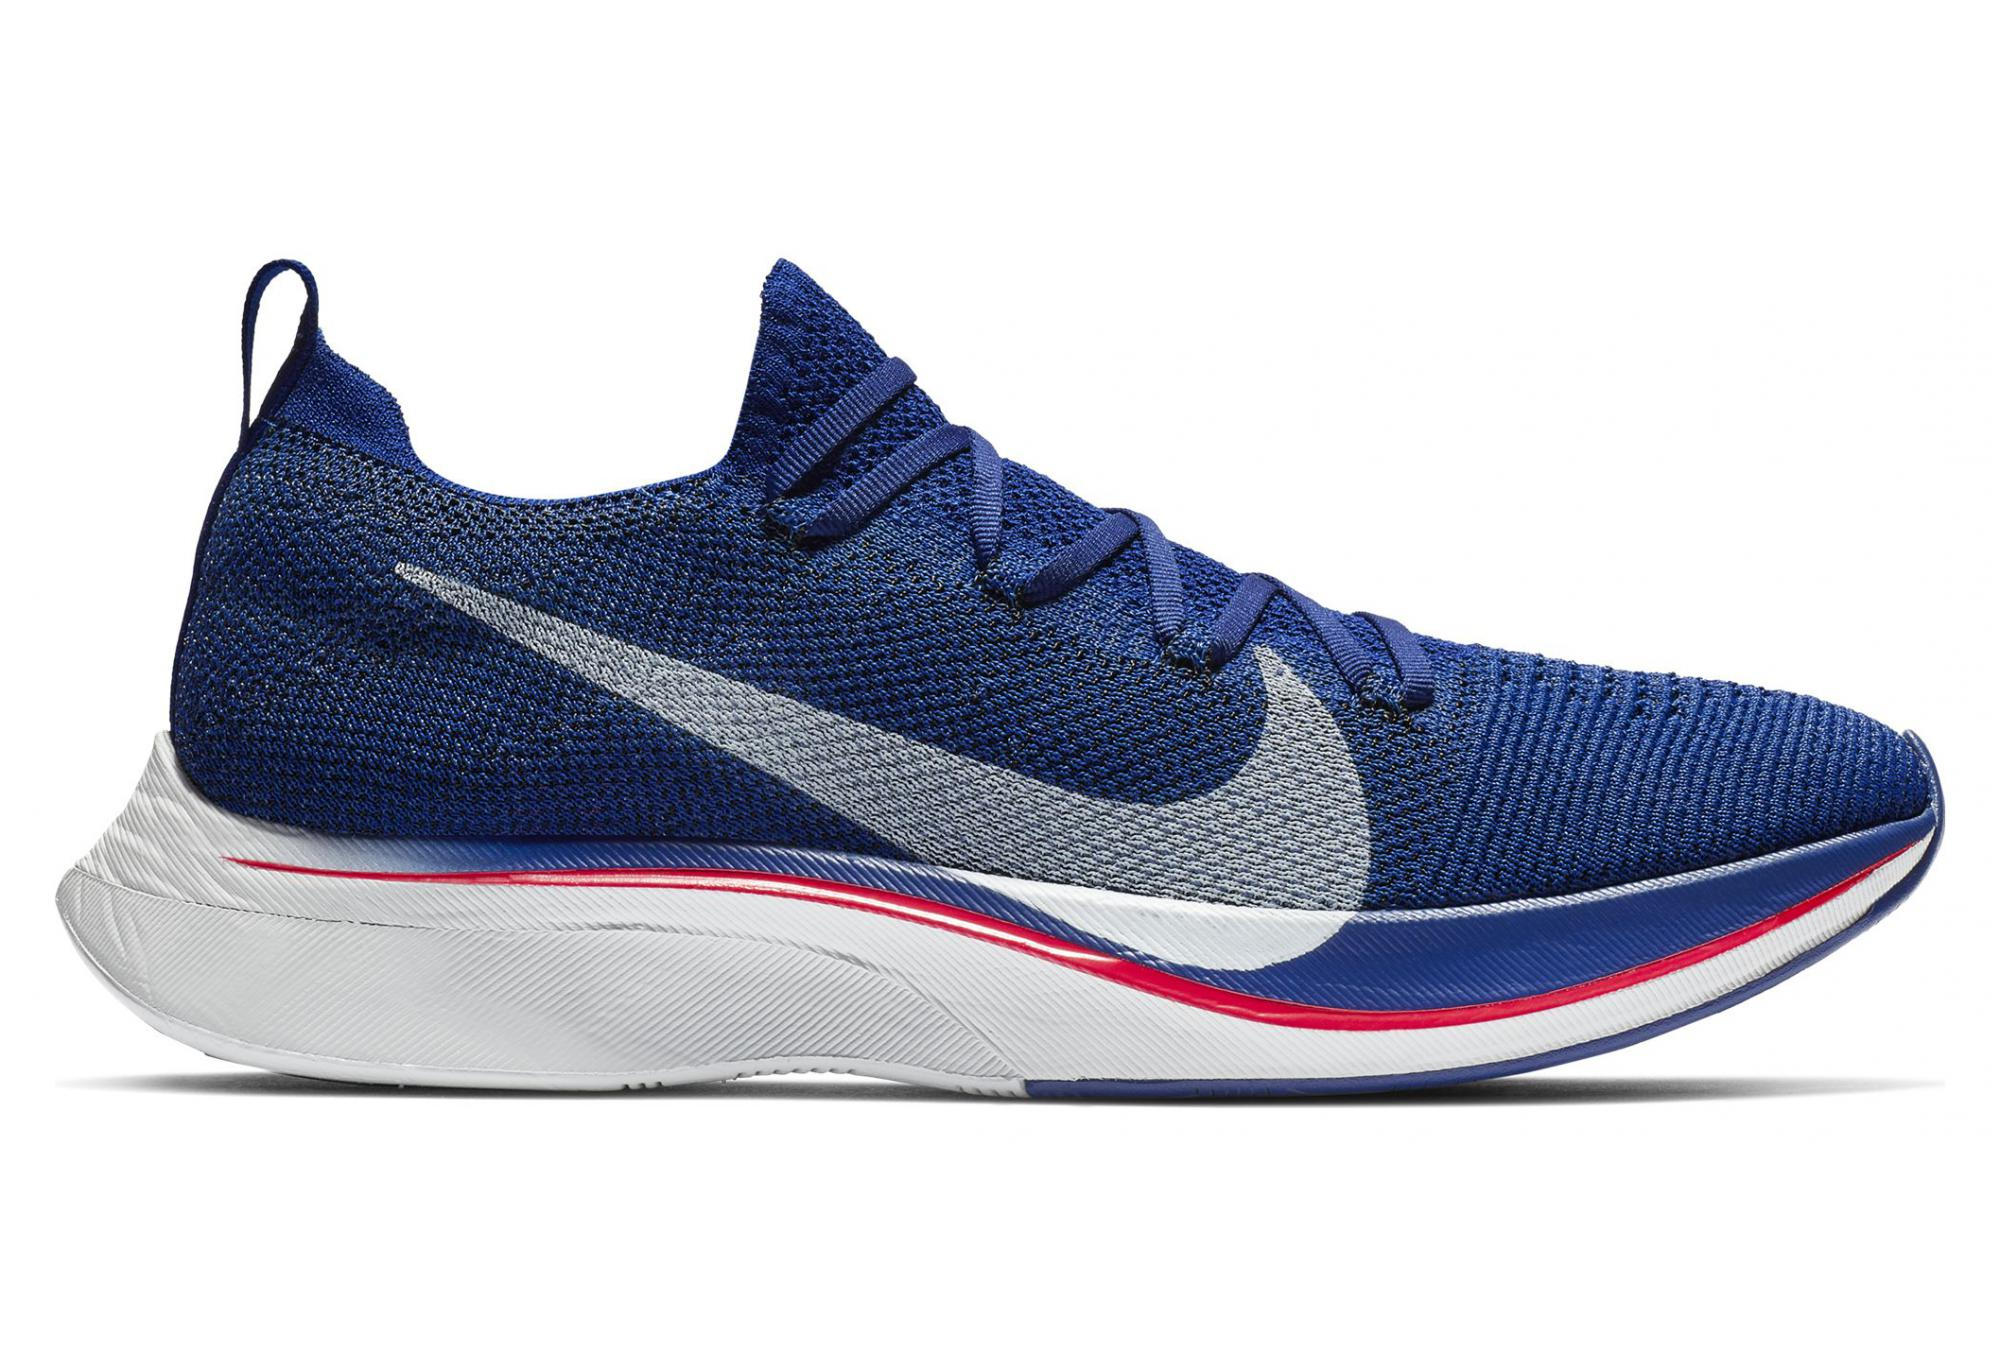 bbc1a80055bd9 Nike Vaporfly 4% Flyknit Blue Pink Unisex